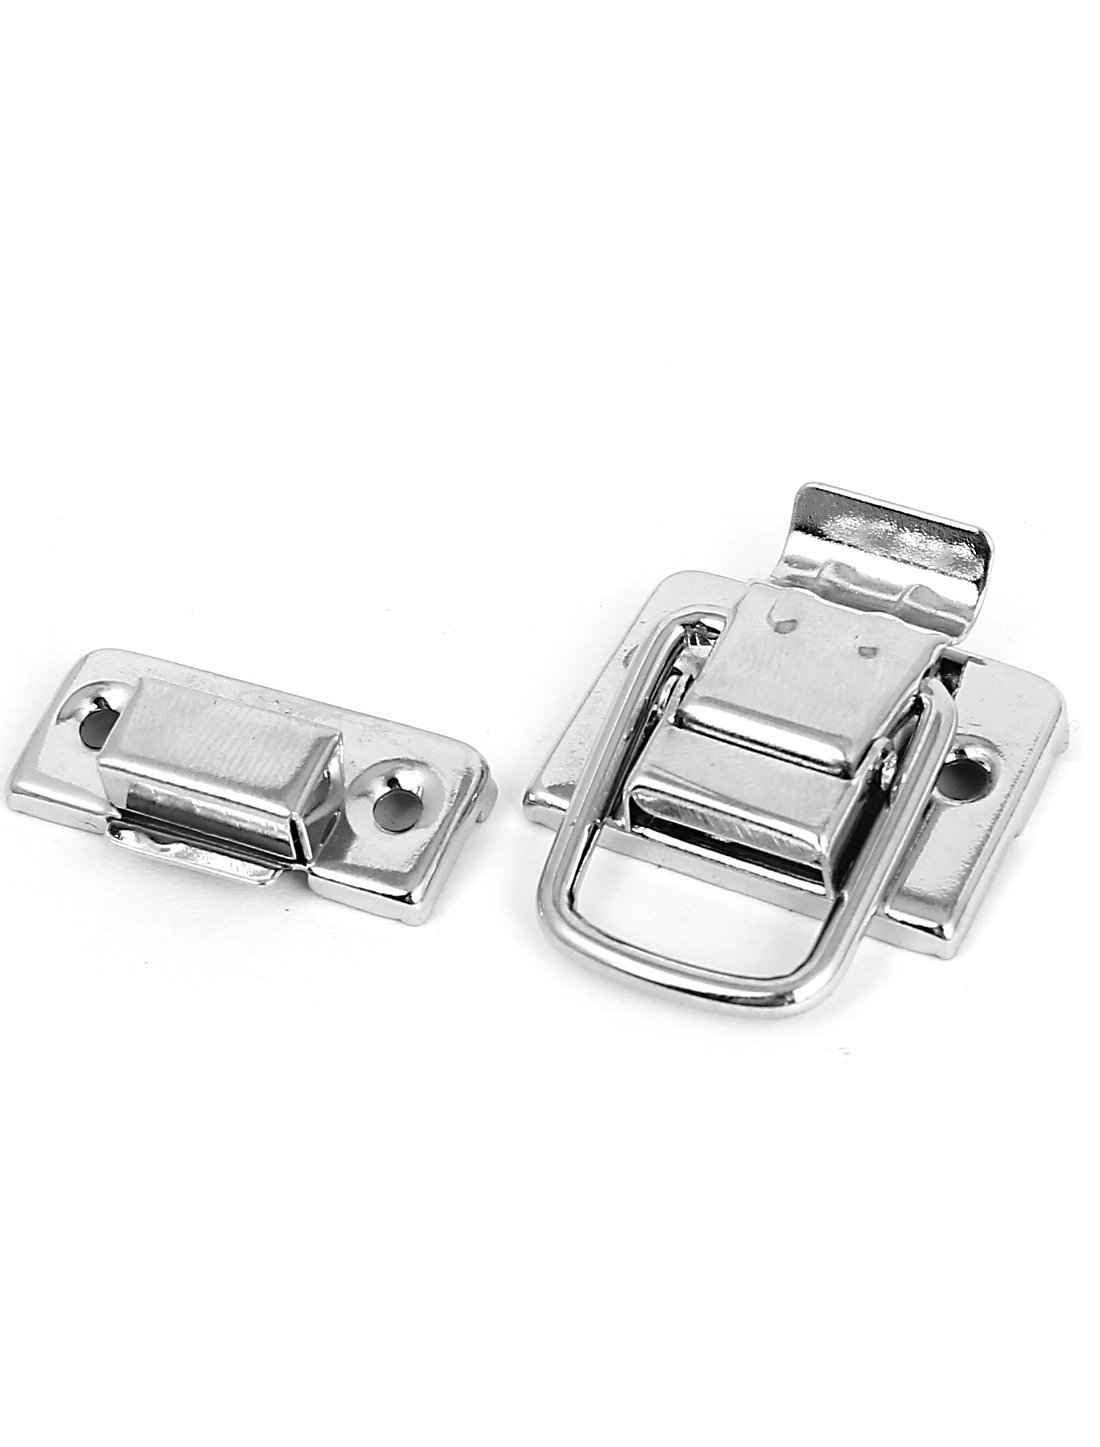 Amazon.com: Cajas maleta cofres del tronco palanca de la cerradura de pestillo tono 5pcs captura de Plata: Kitchen & Dining